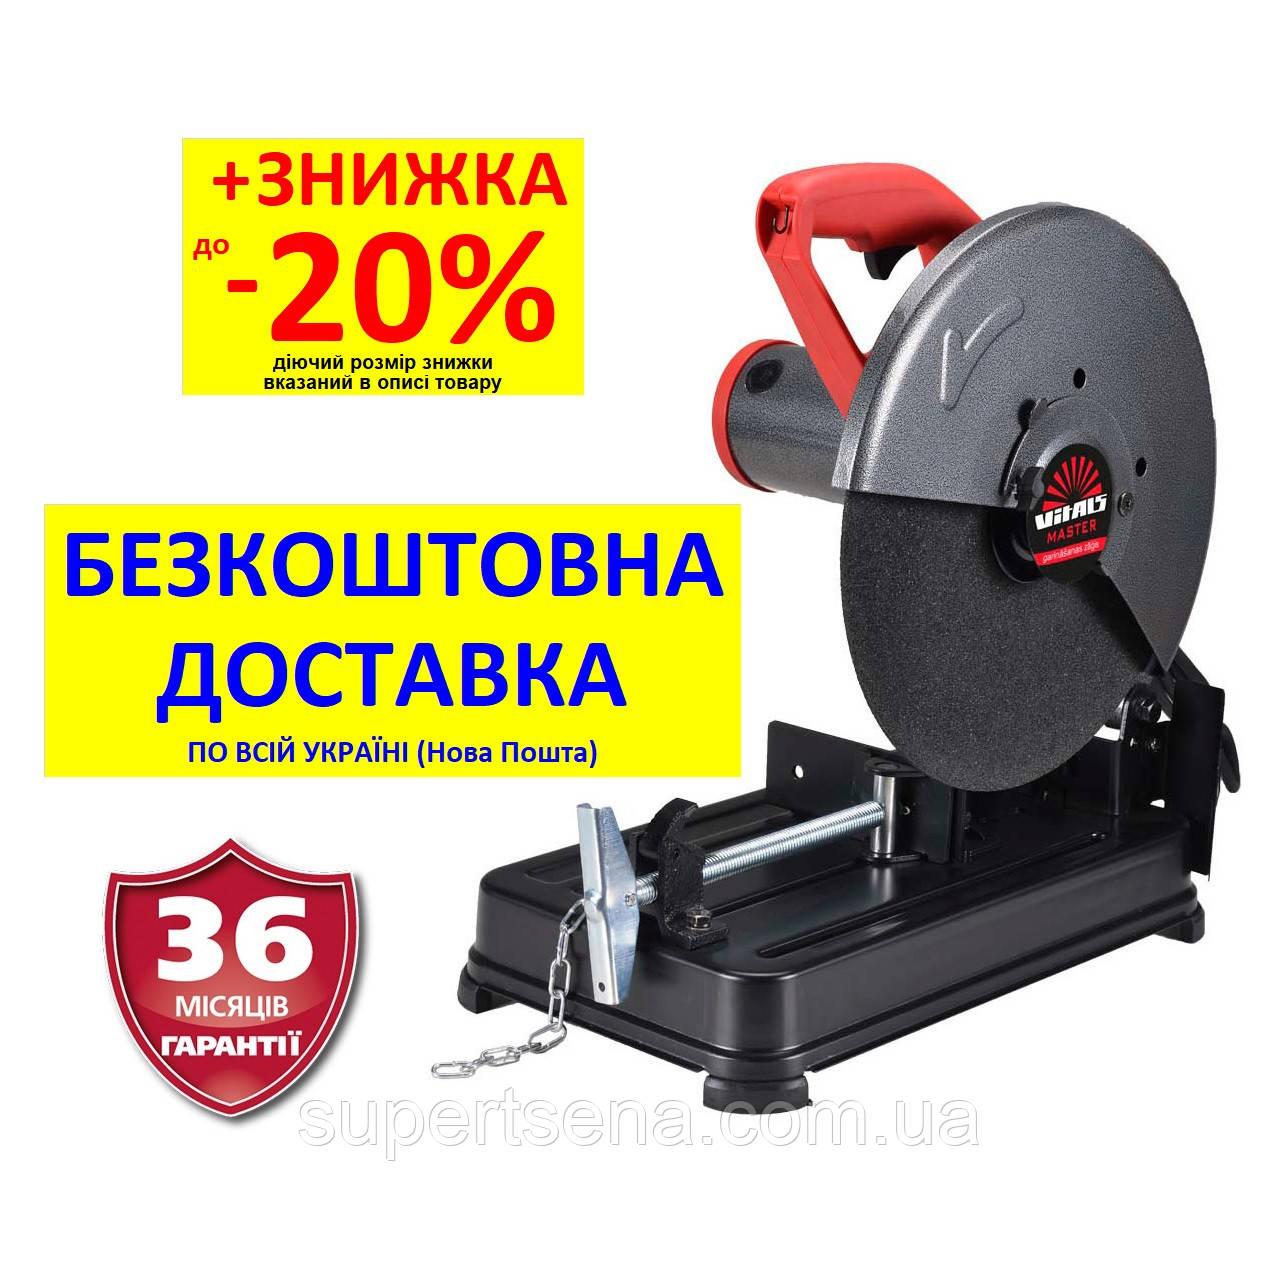 Відрізна пила Gr 3525HL (2,45 кВт) +БЕЗКОШТОВНА ДОСТАВКА! диск 355 мм (VITALS Master, Латвія)